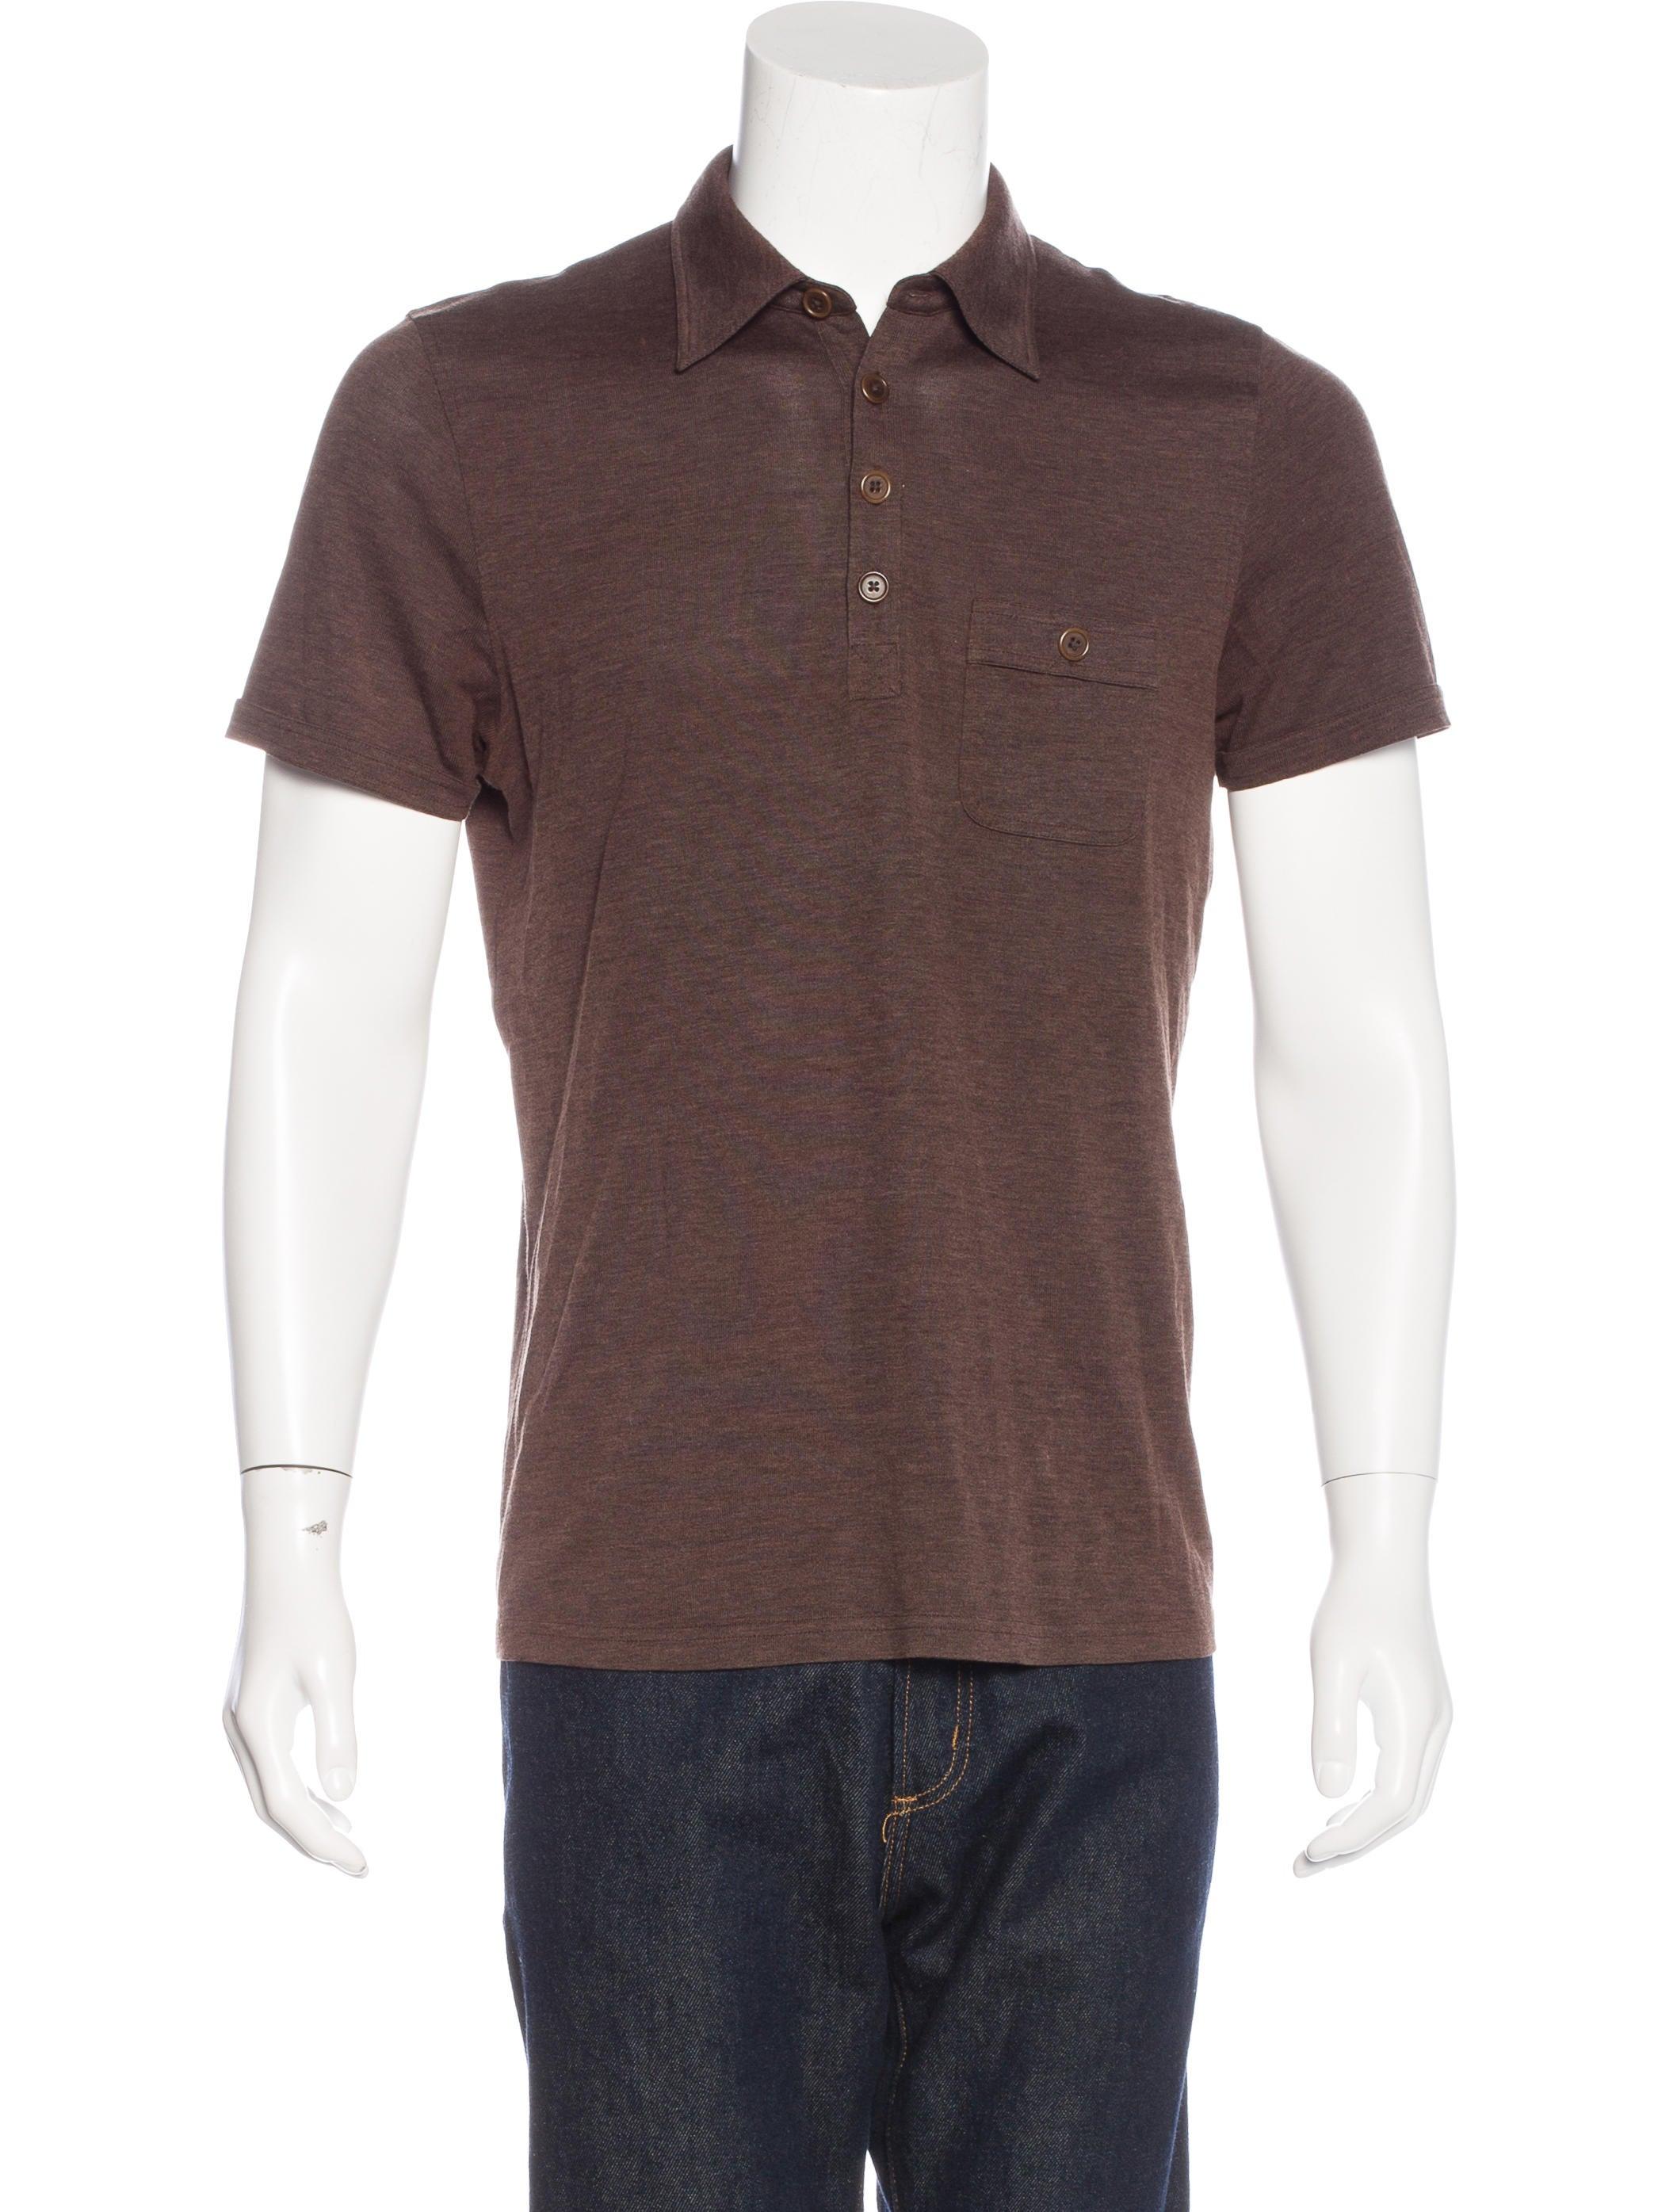 John Varvatos Silk Polo Shirt Clothing Jva23344 The